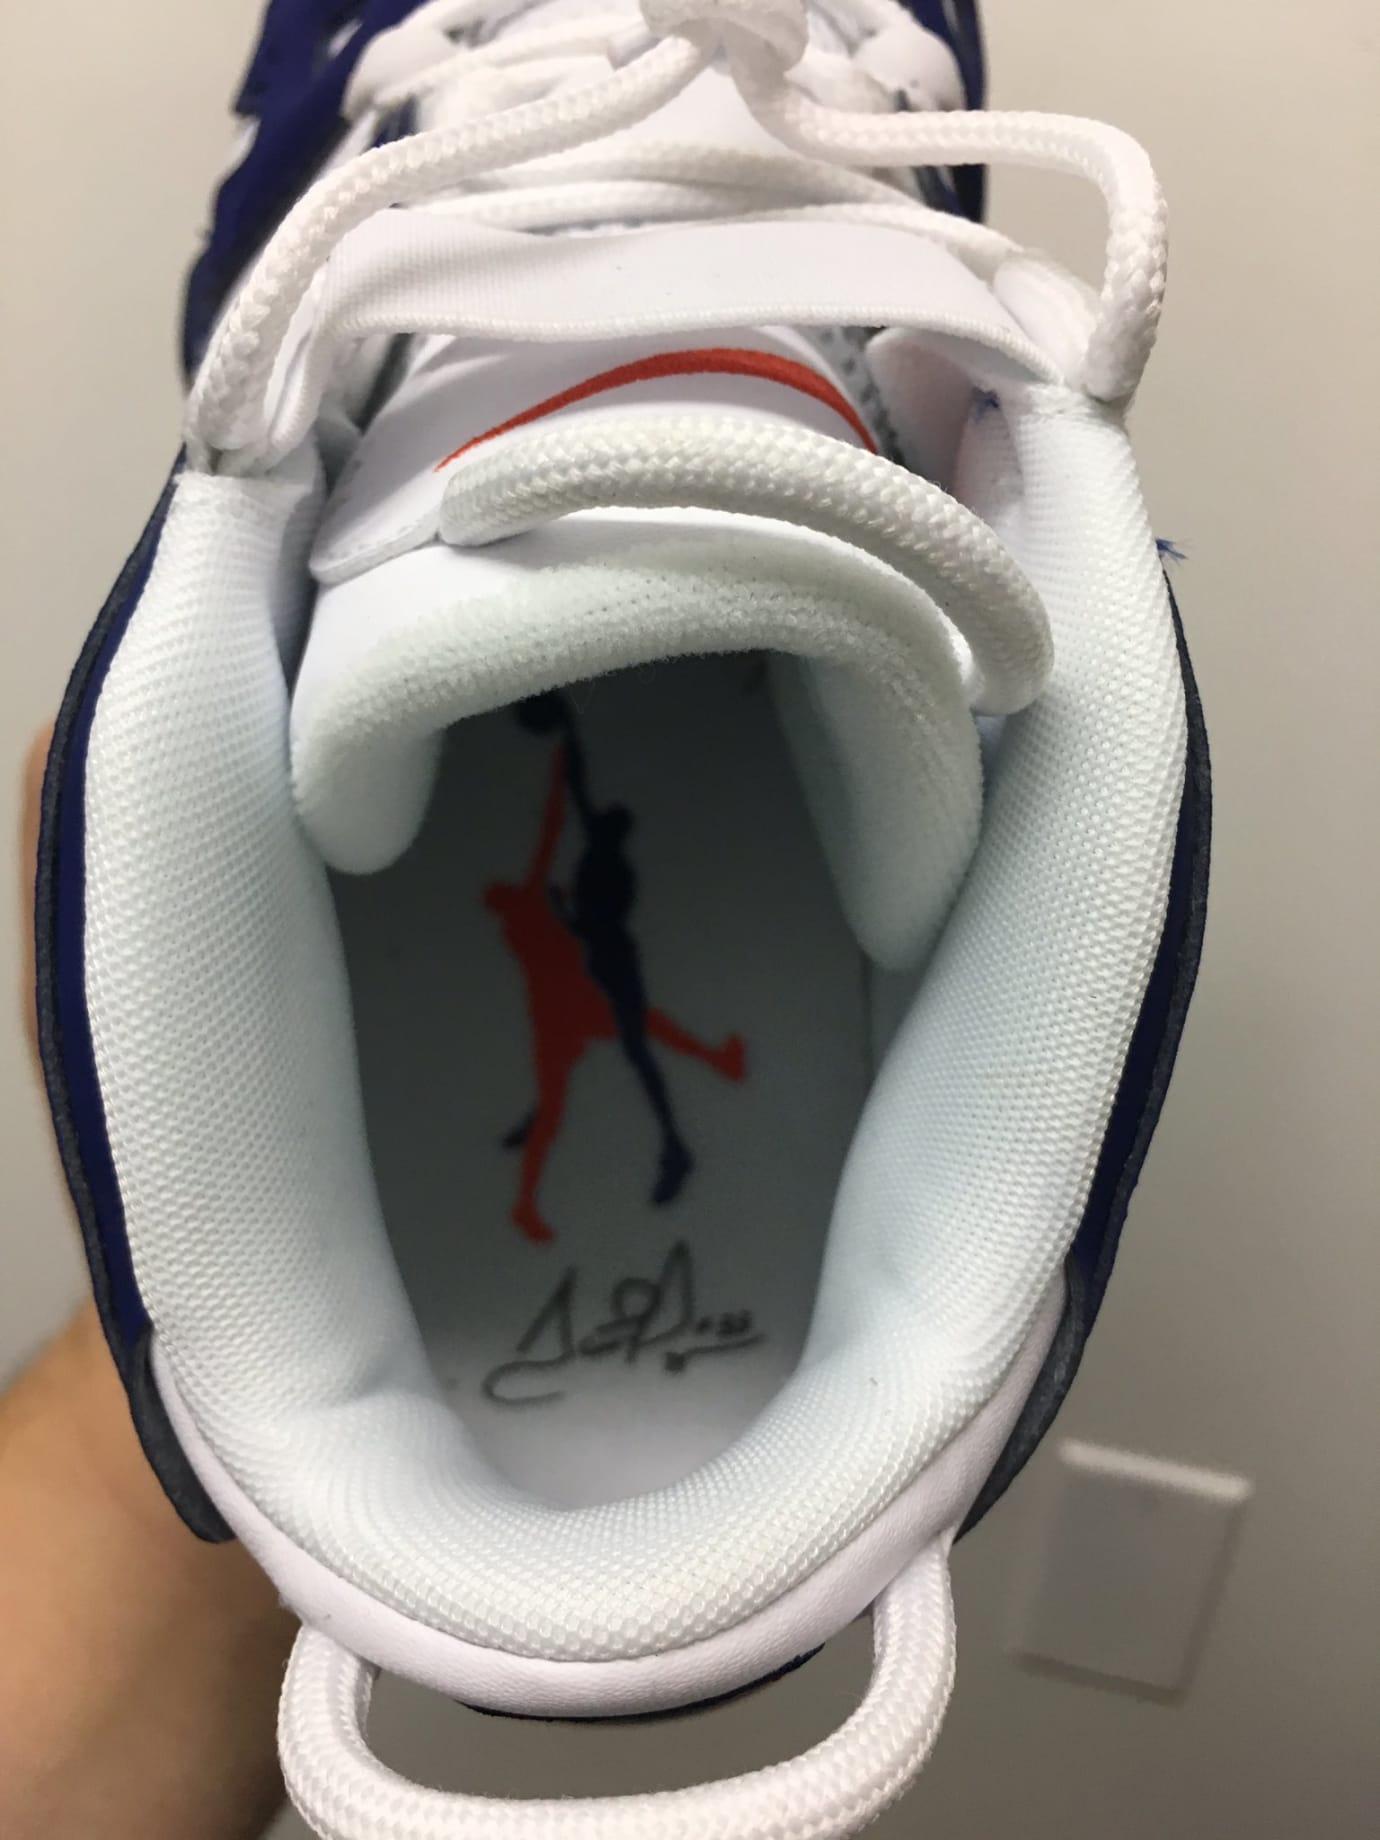 0d4a6a513c6 Nike Air More Uptempo Scottie Pippen Patrick Ewing Knicks Dunk ...